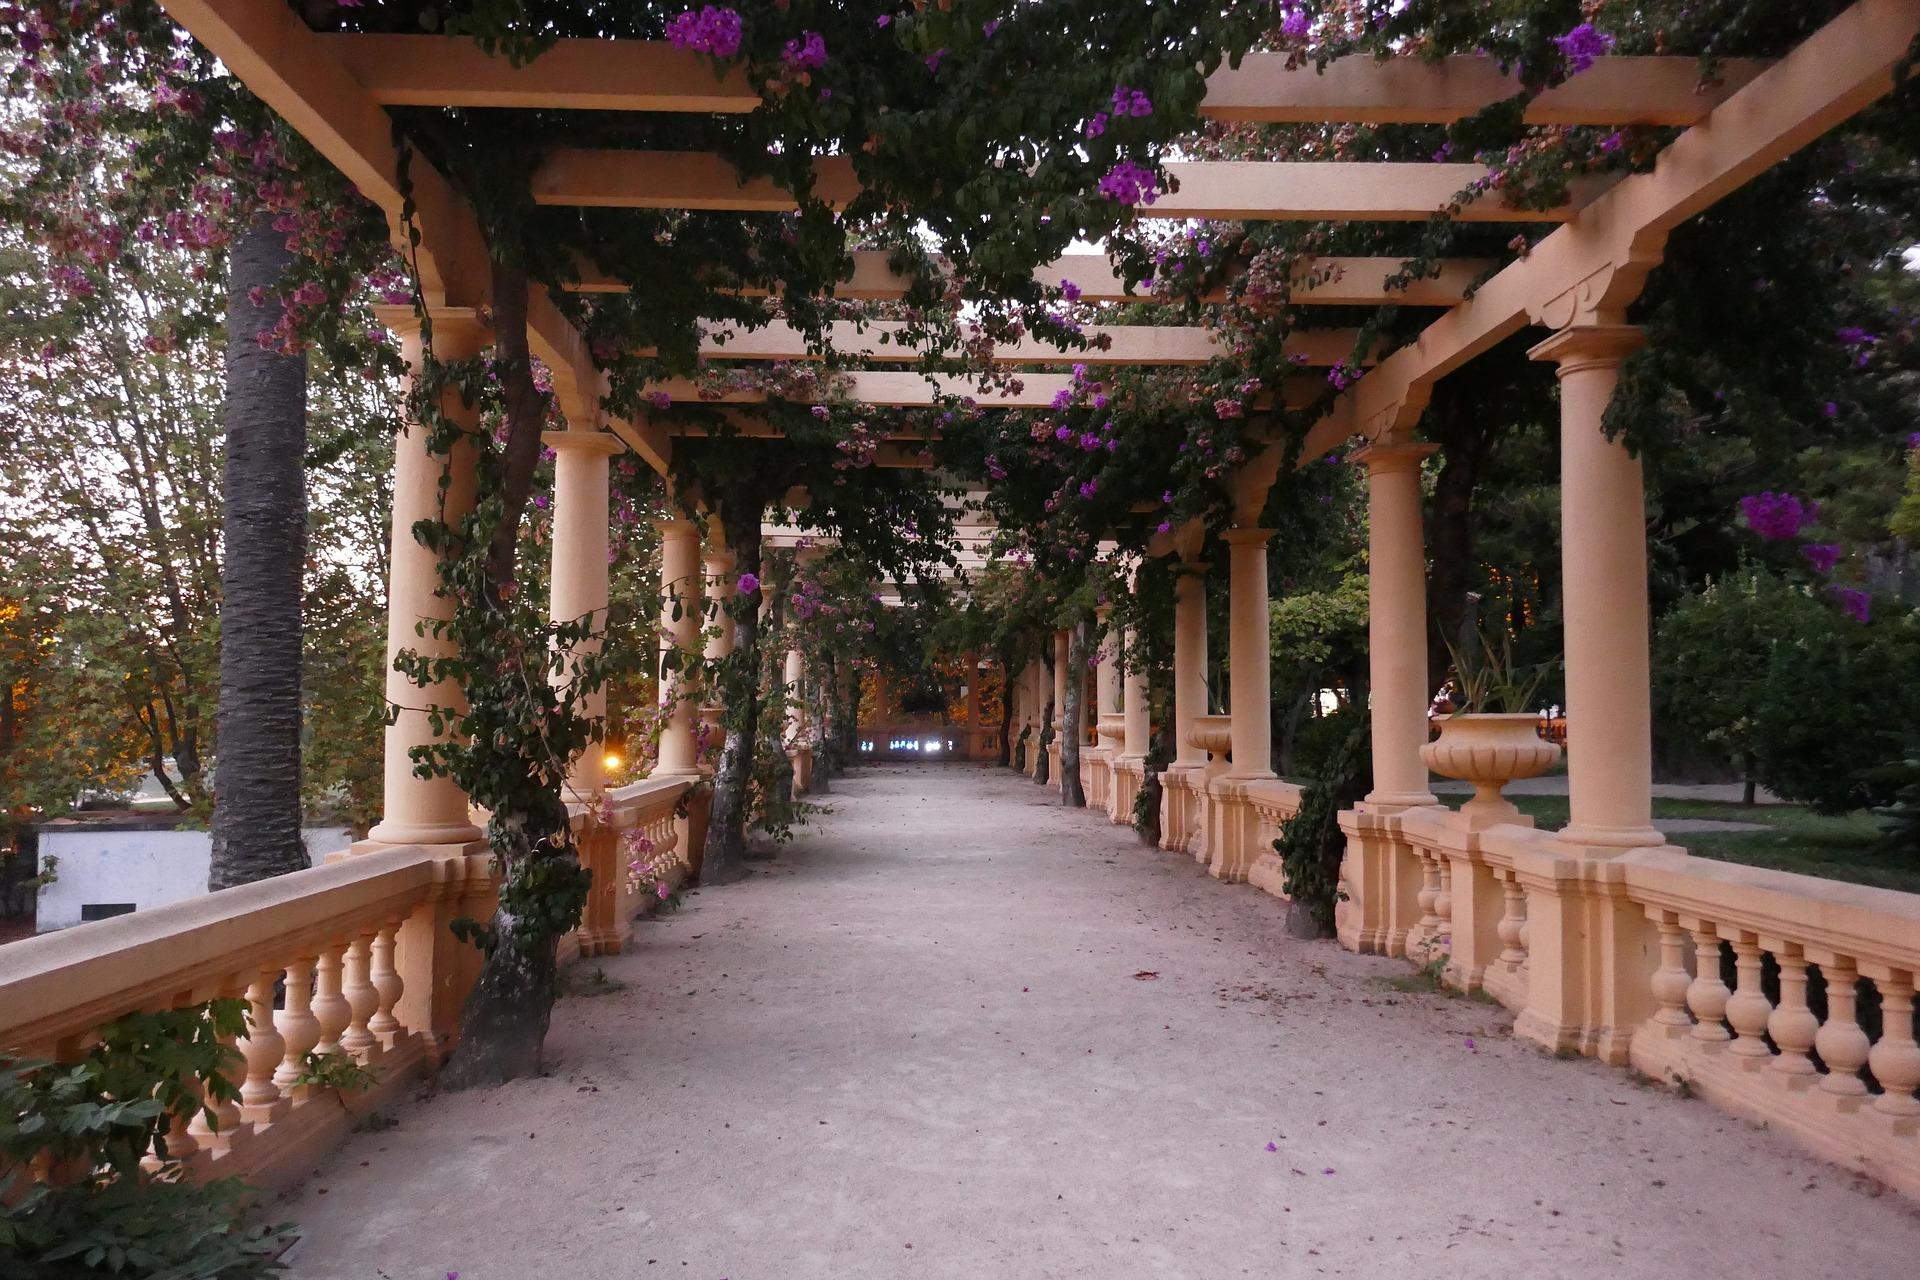 Park in Aveiro